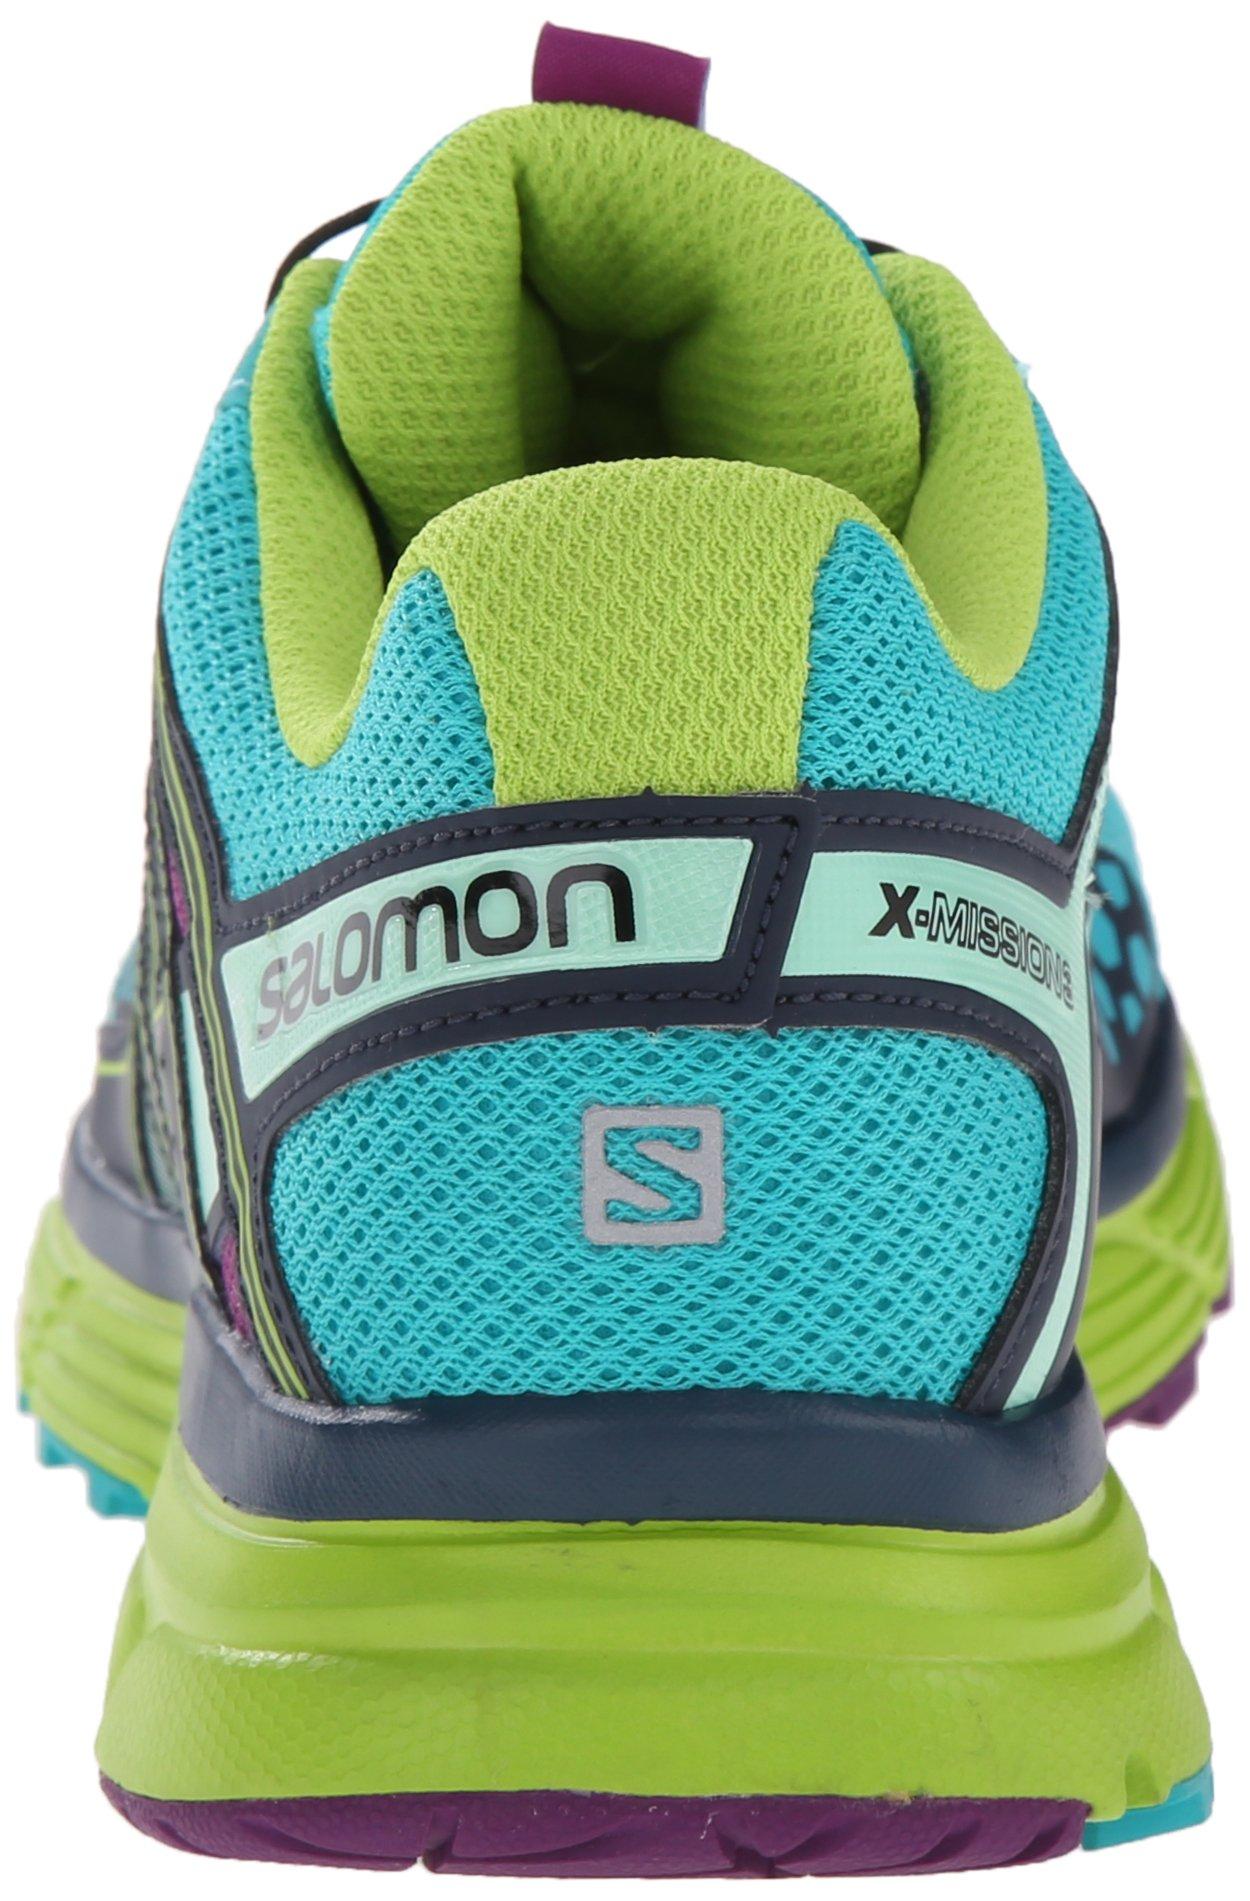 Salomon Women's X-Mission 3 W Trail Running Shoe, Teal Blue/Granny Green/Passion Purple, 7.5 B US by Salomon (Image #2)